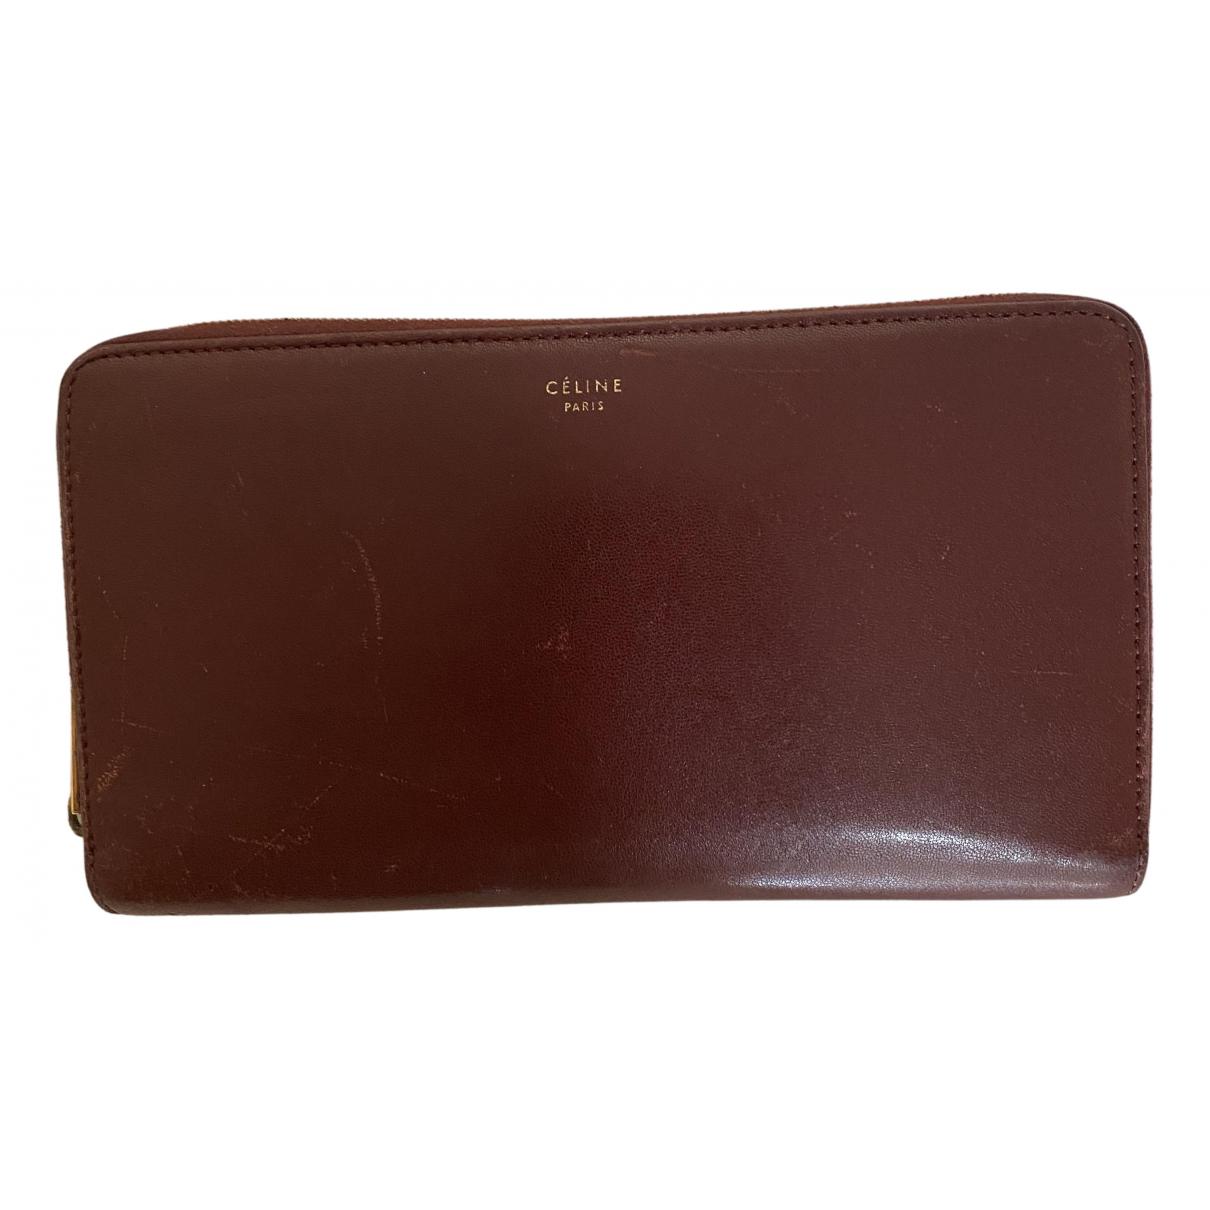 Celine N Burgundy Leather wallet for Women N